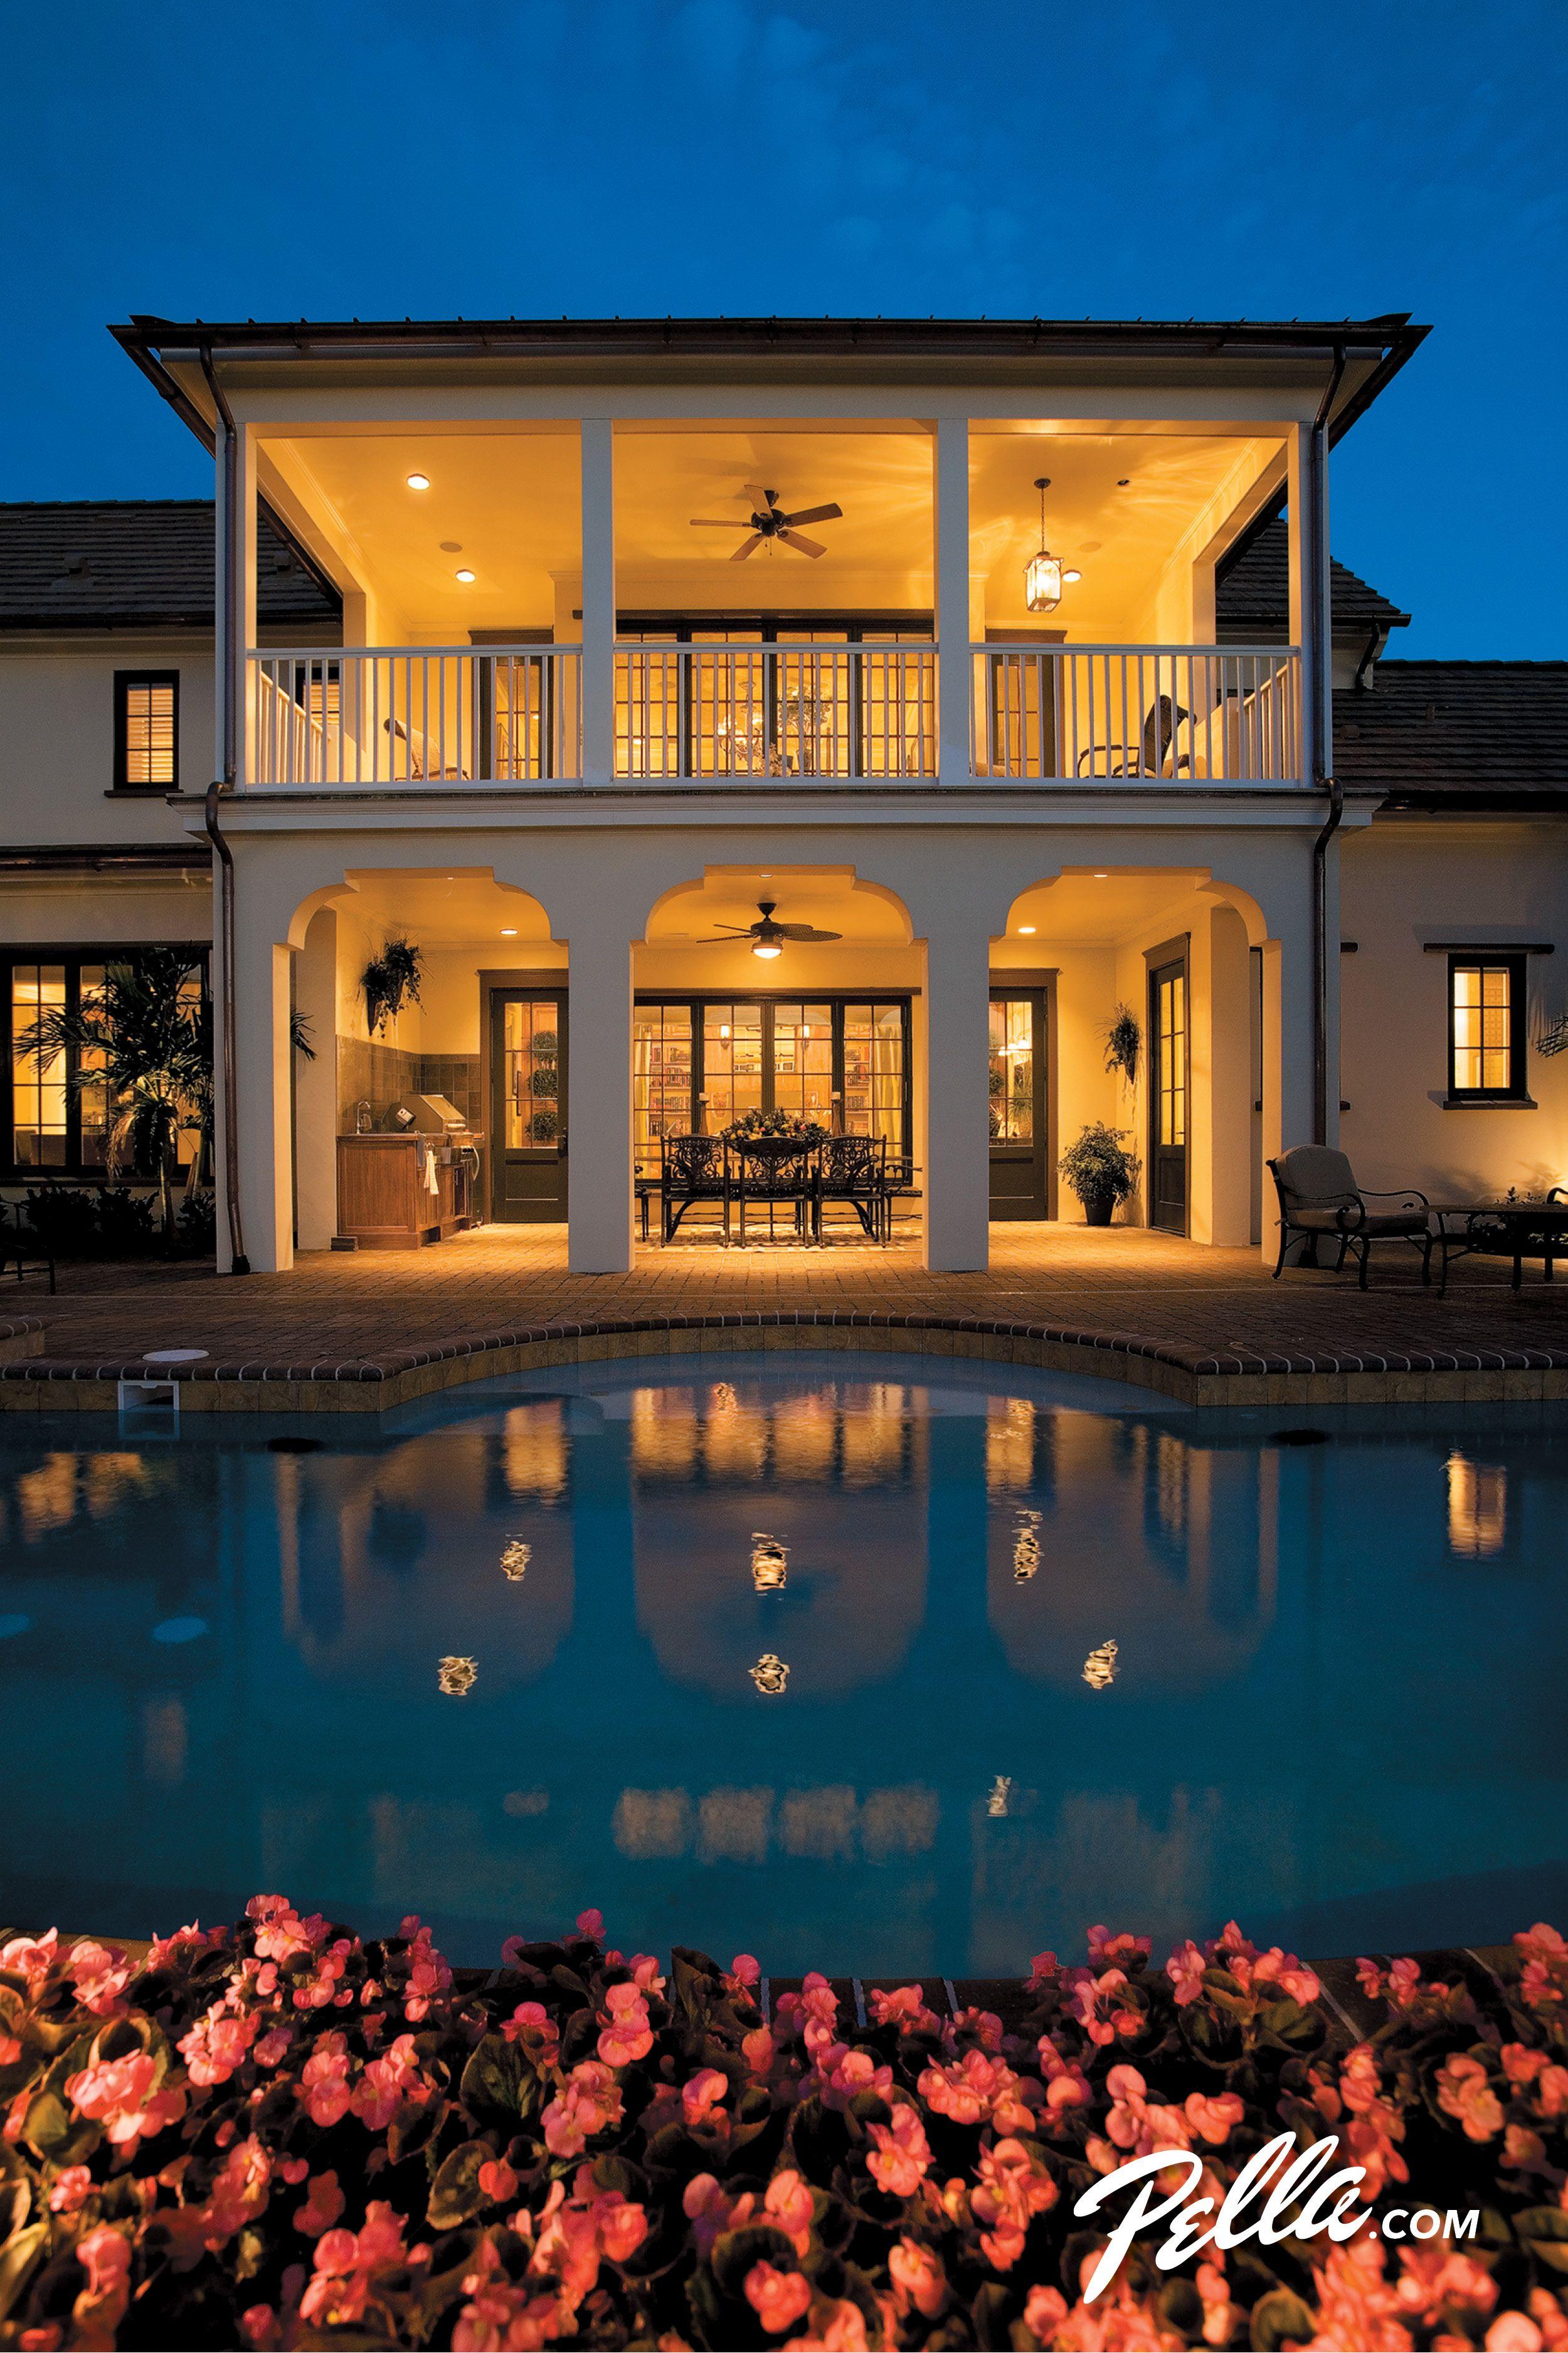 Pella Architect Series hinged patio doors and casement windows